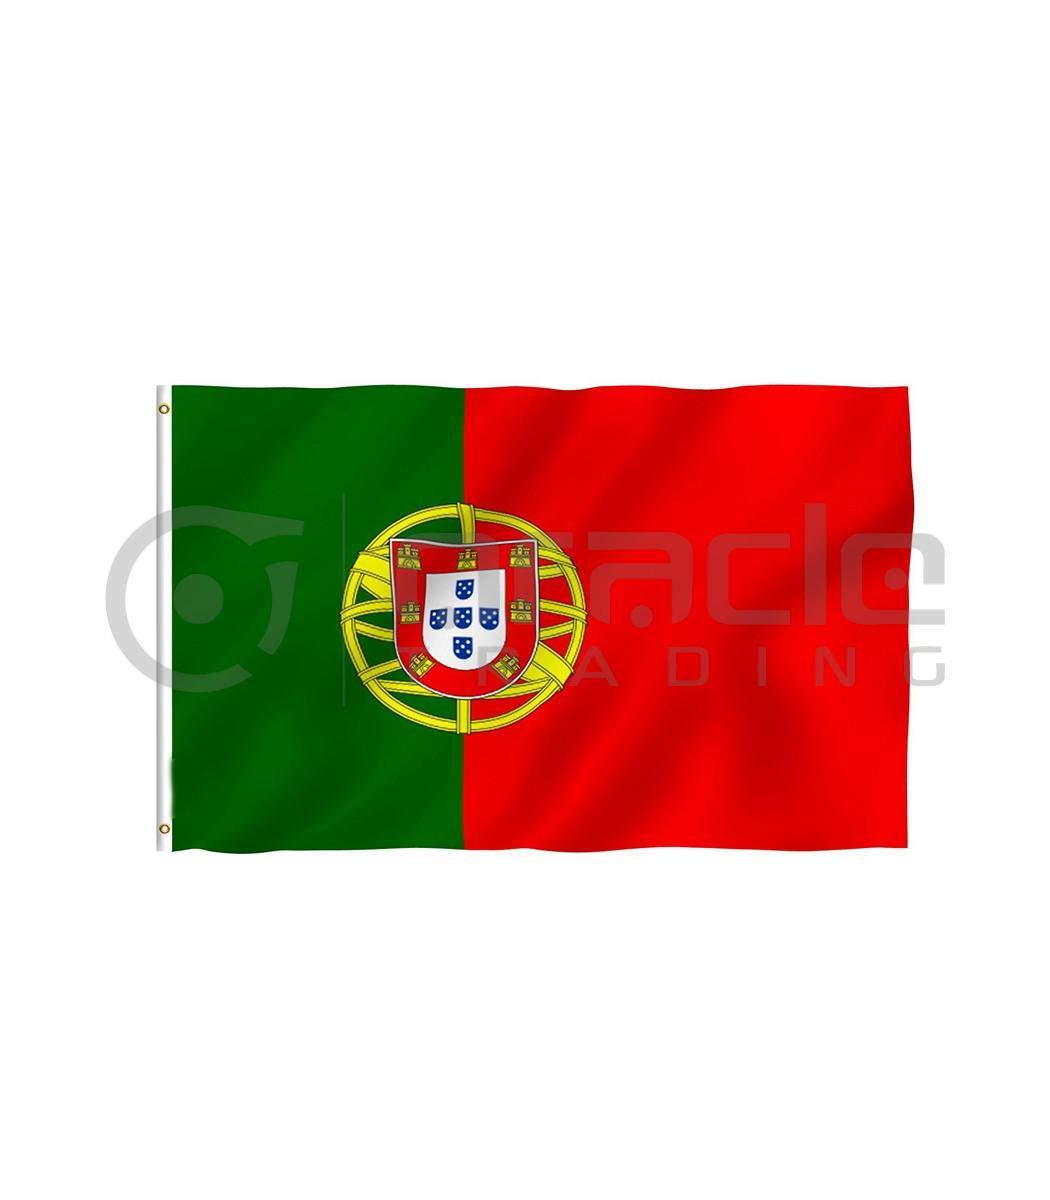 Large 3'x5' Portugal Flag